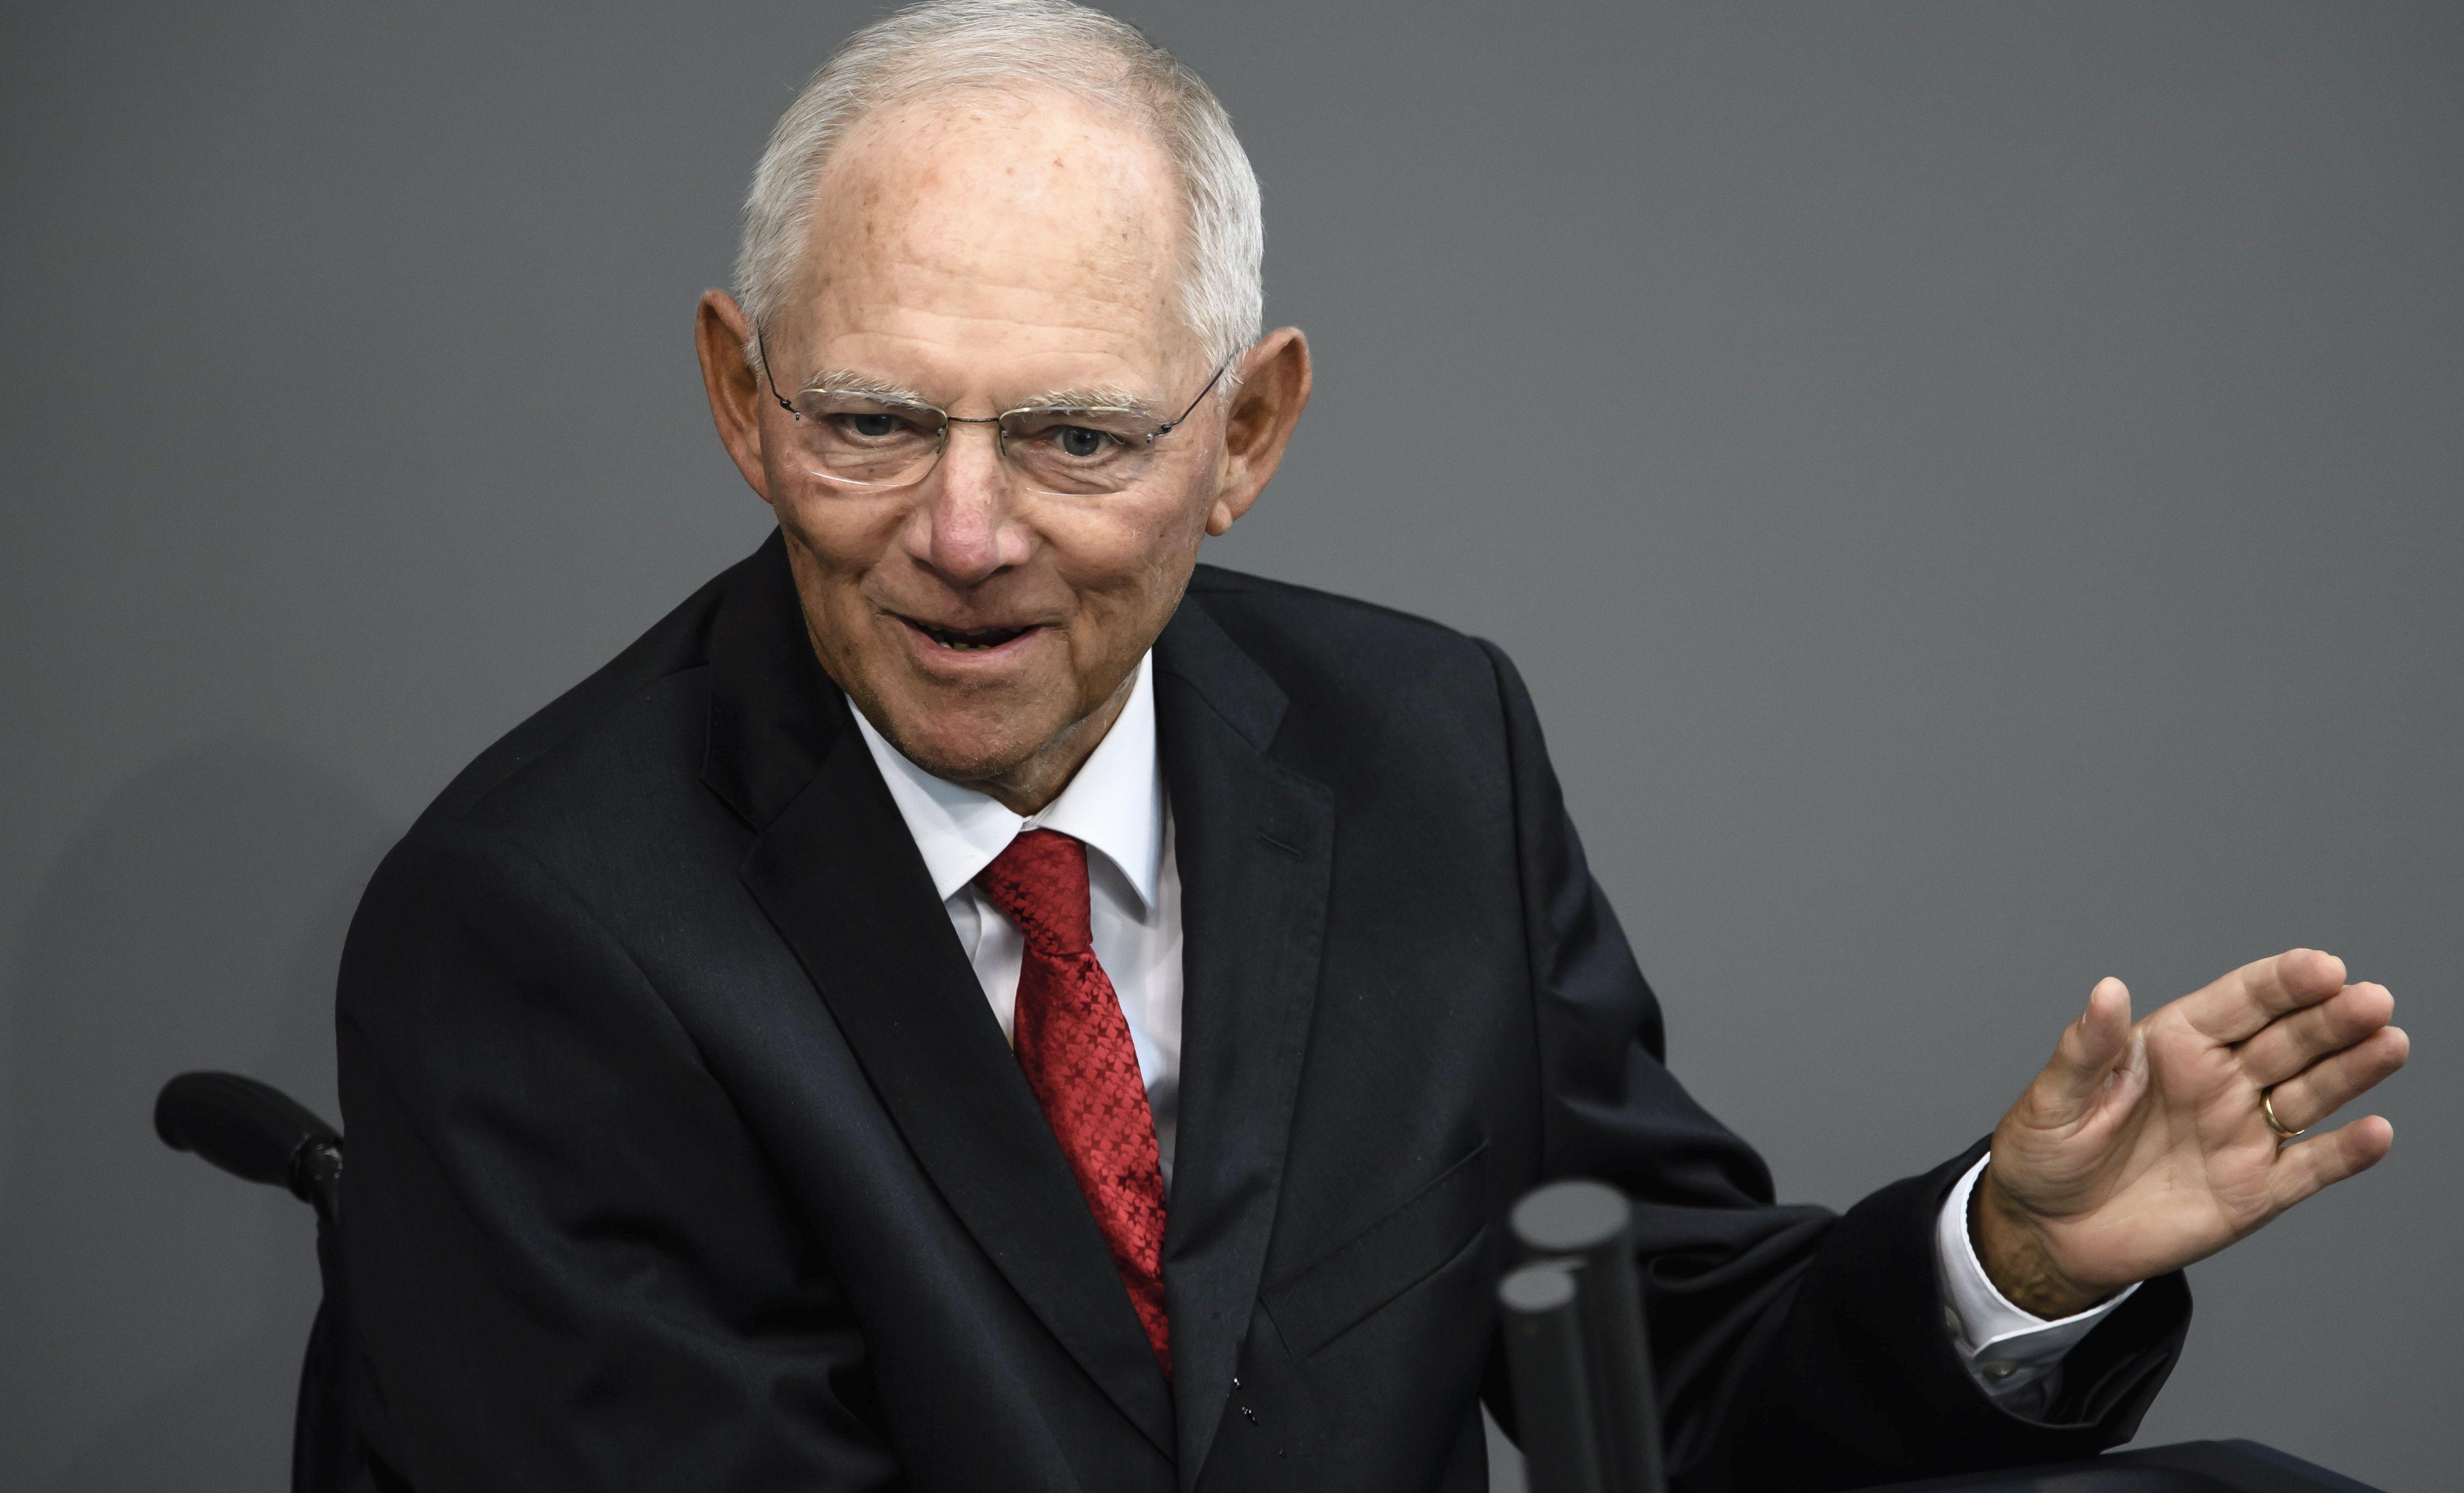 NJEMAČKA Wolfgang Schaeuble postaje predsjednik Bundestaga